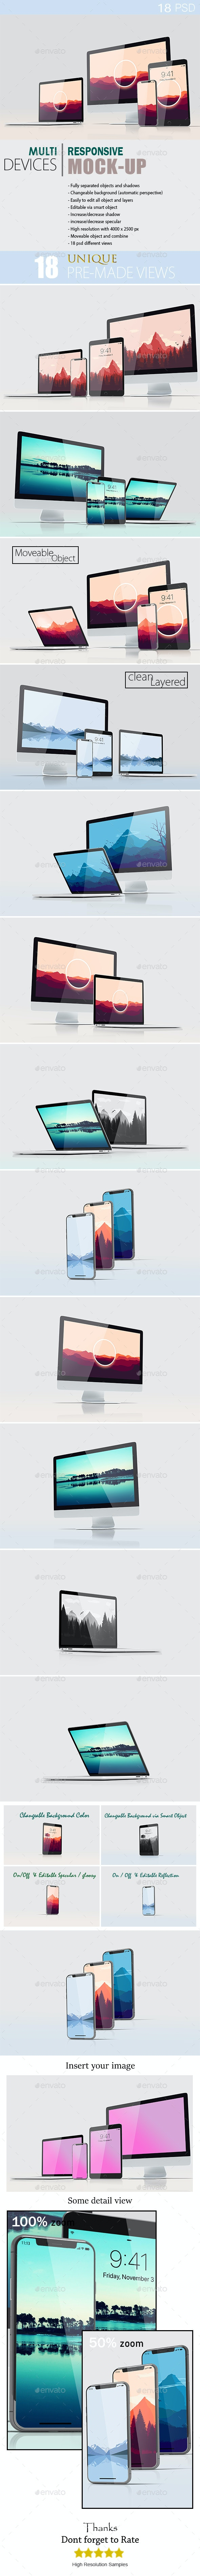 Multi Devices Responsive Mockup - Multiple Displays